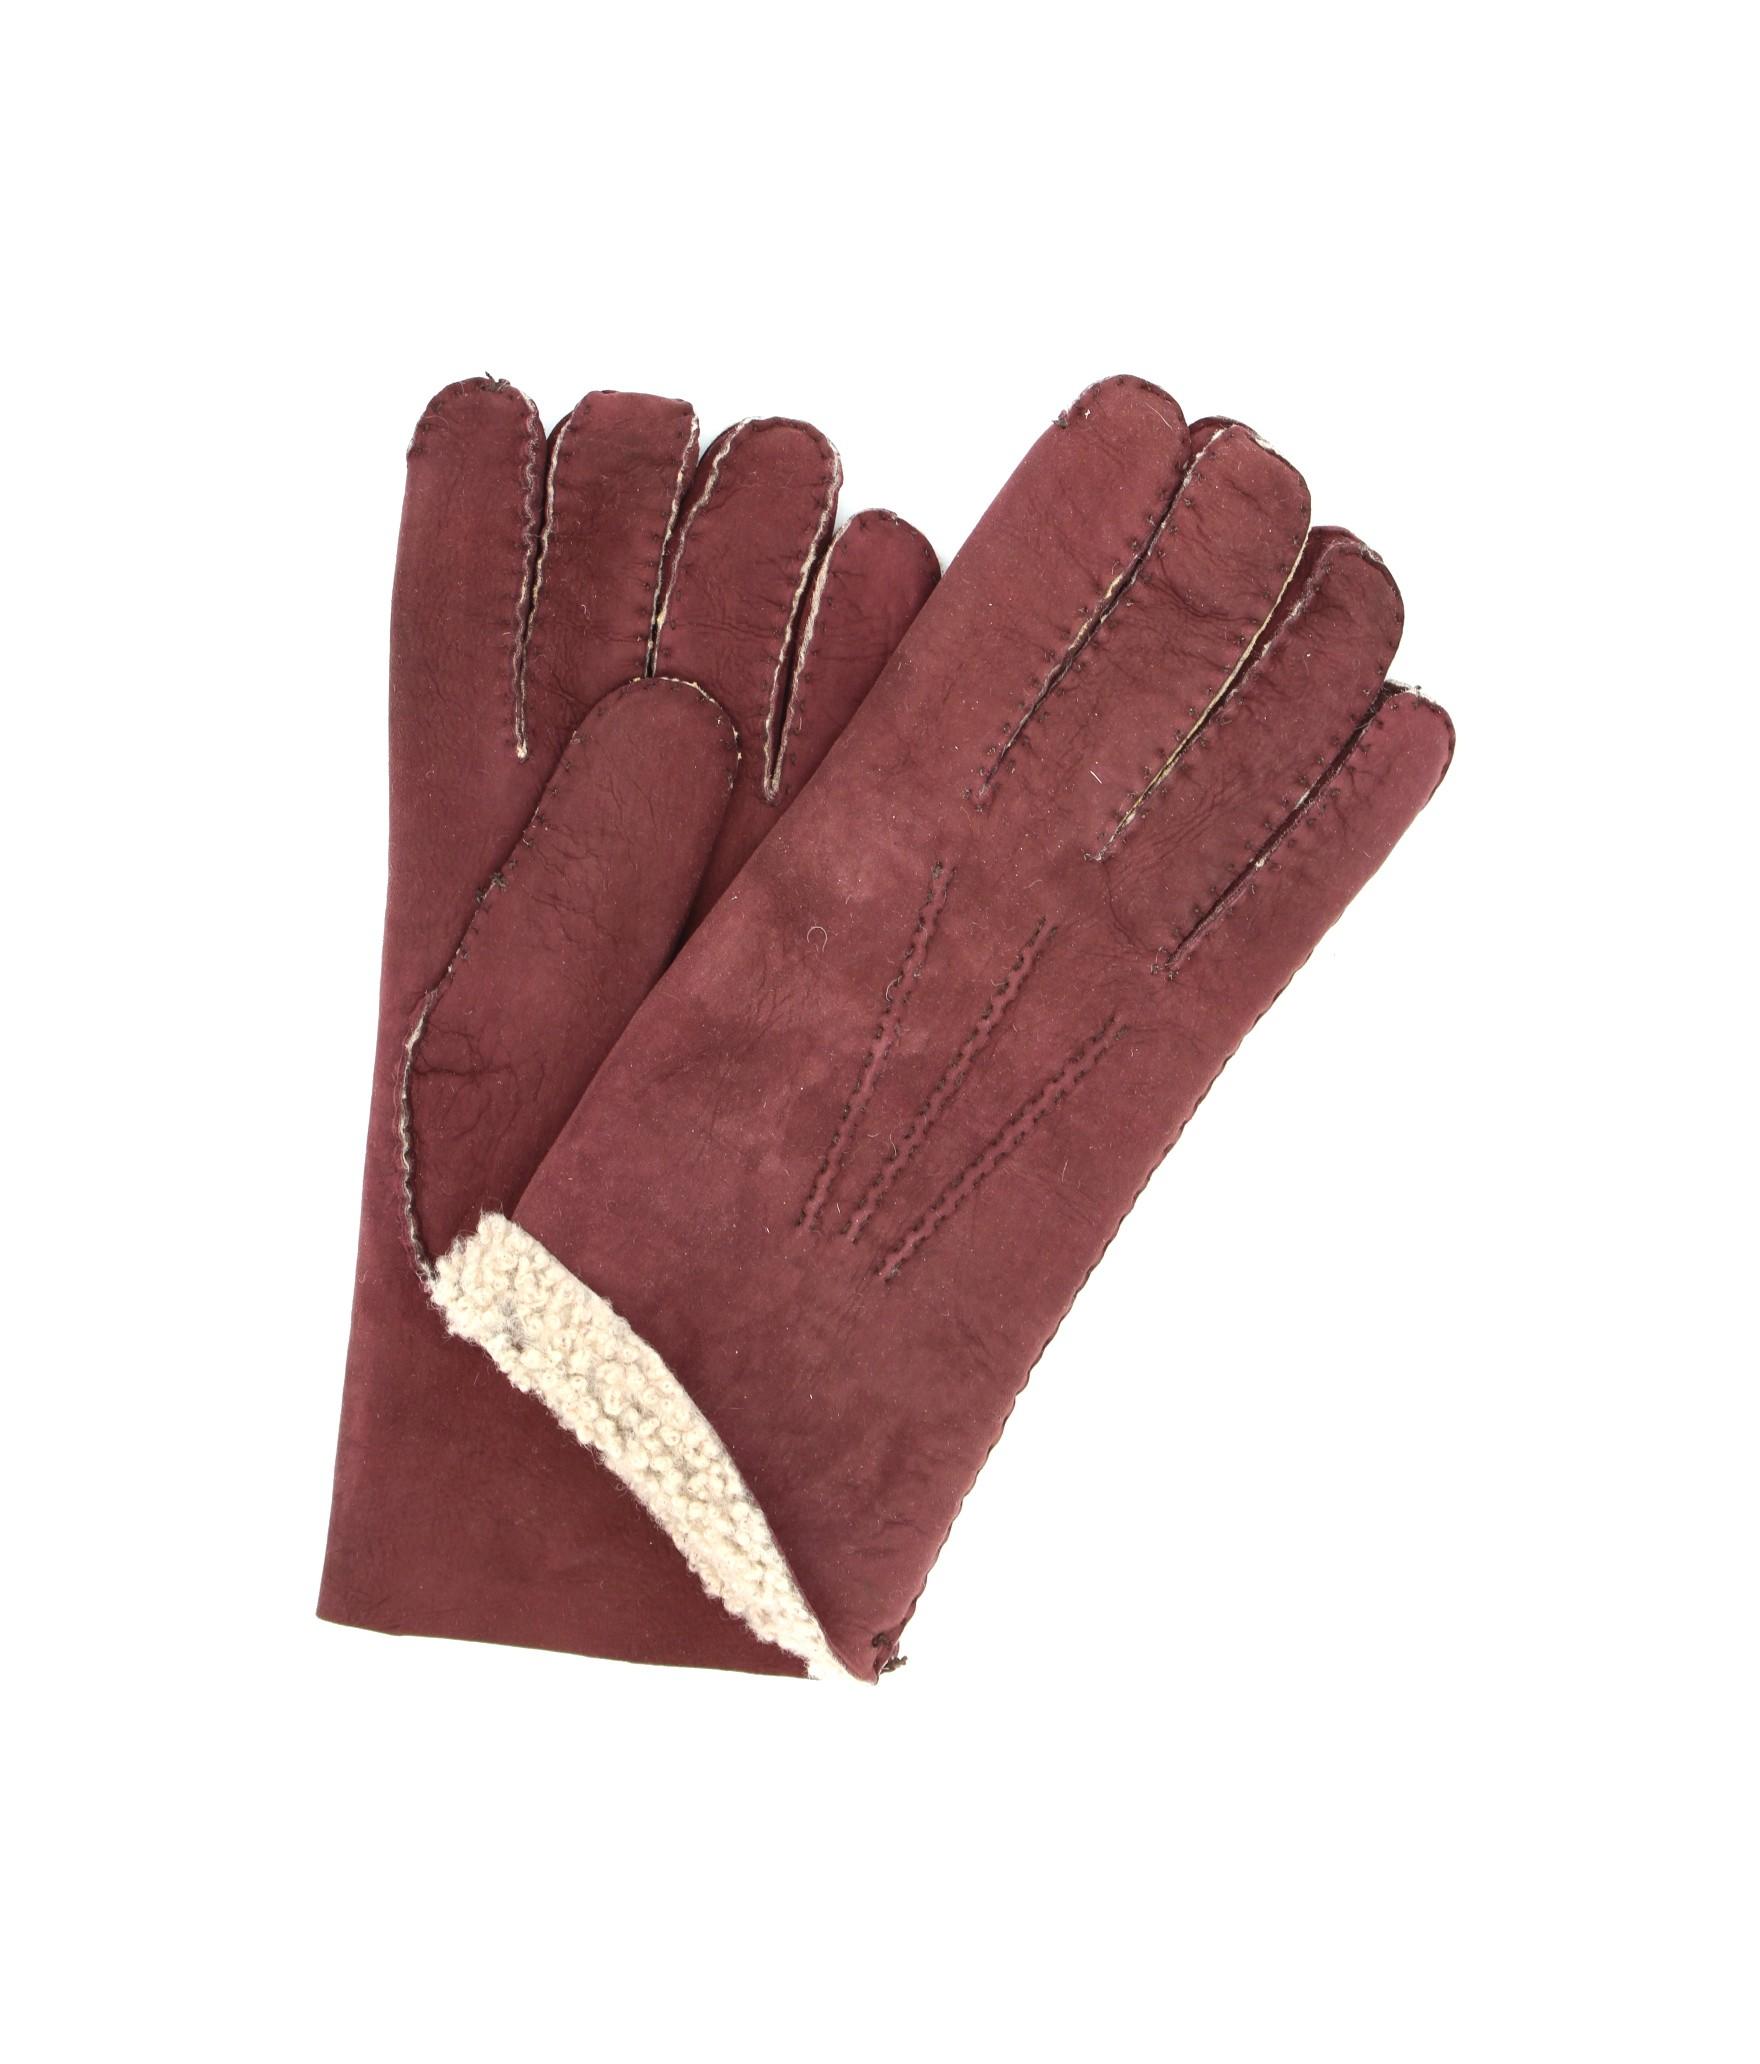 Sheepskin gloves with hand stitching Bordeaux Sermoneta Gloves